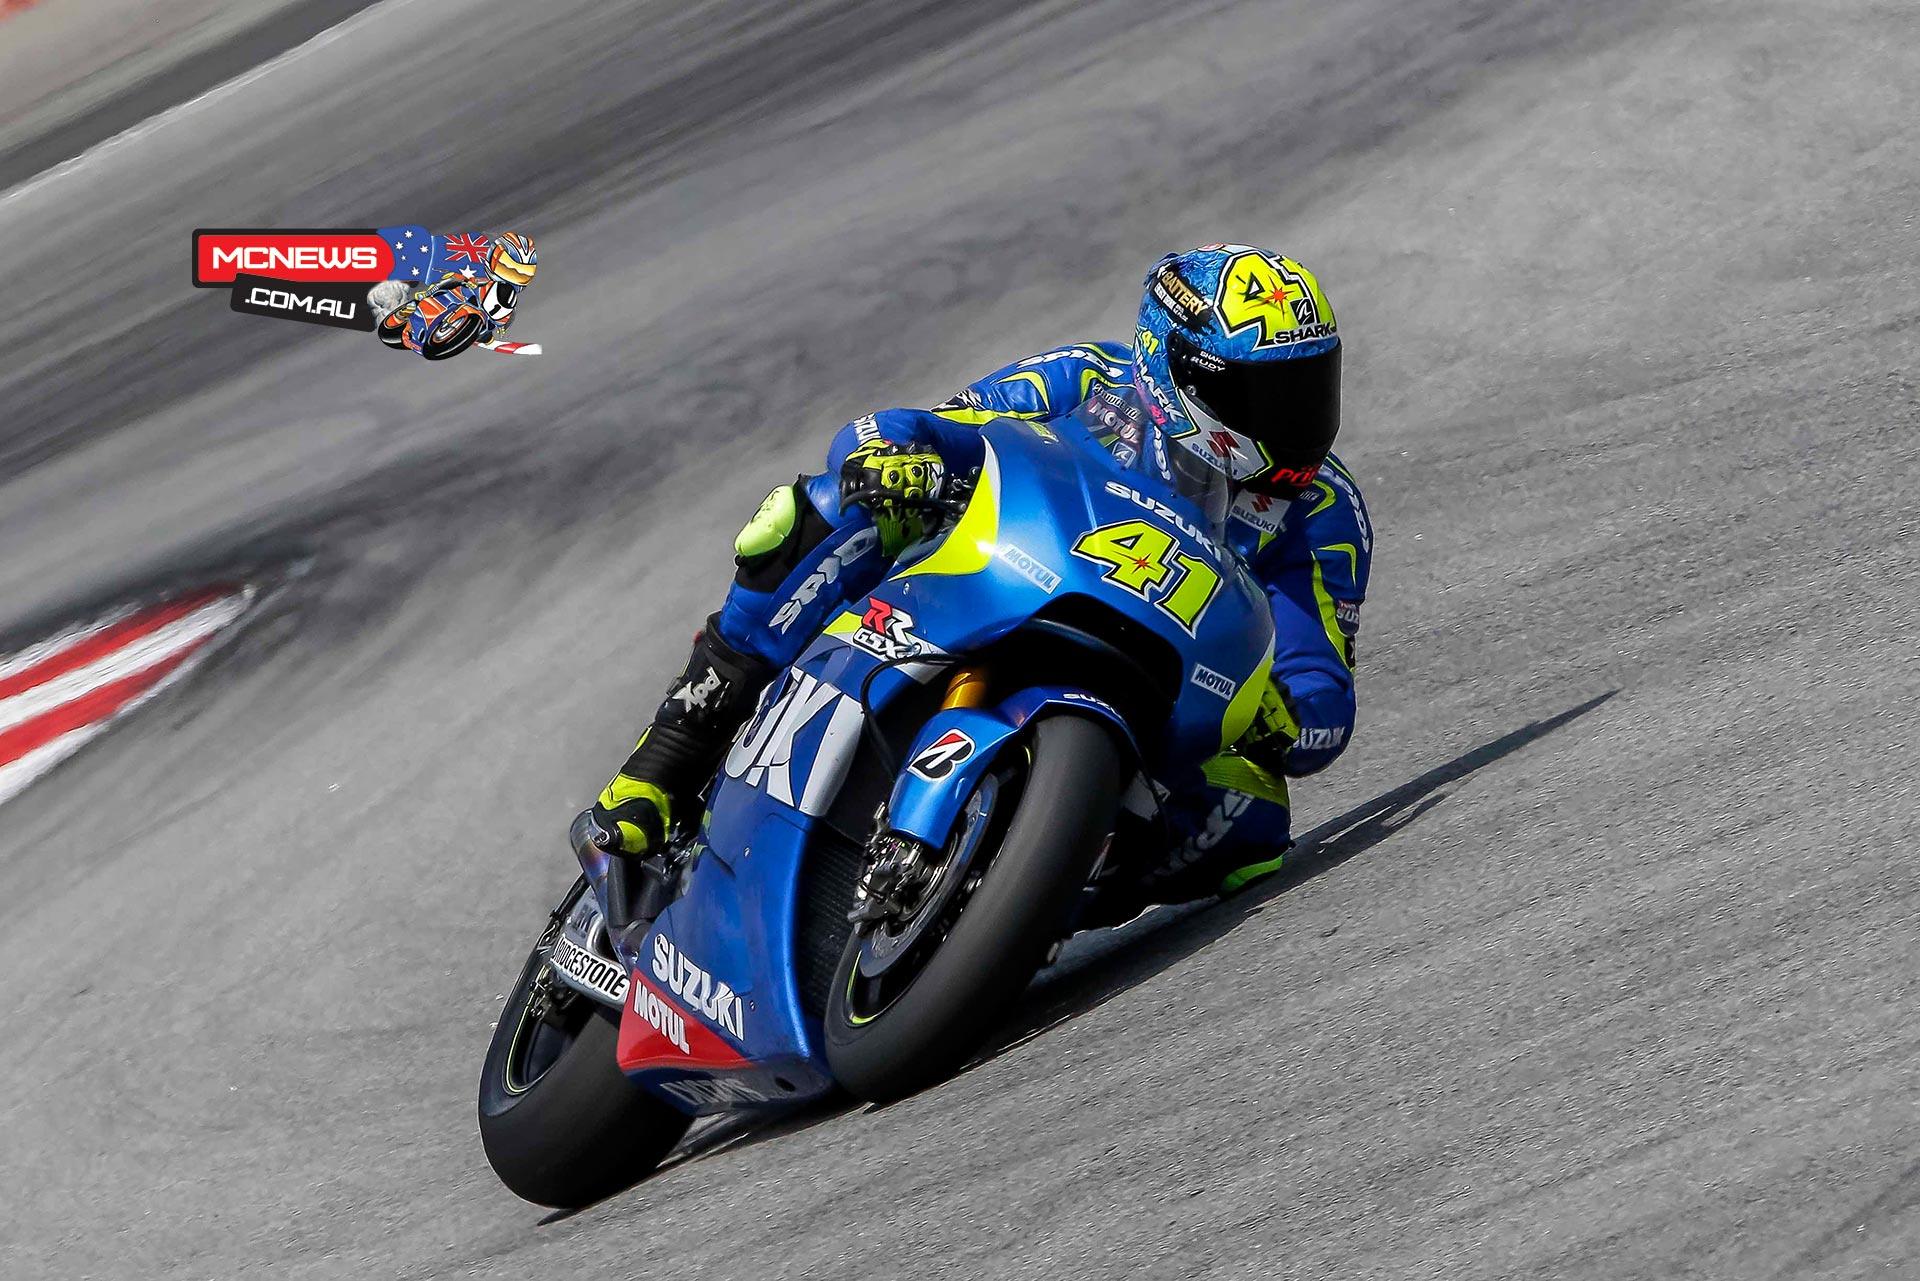 Rossi tops day 1 at Sepang 2 MotoGP Test